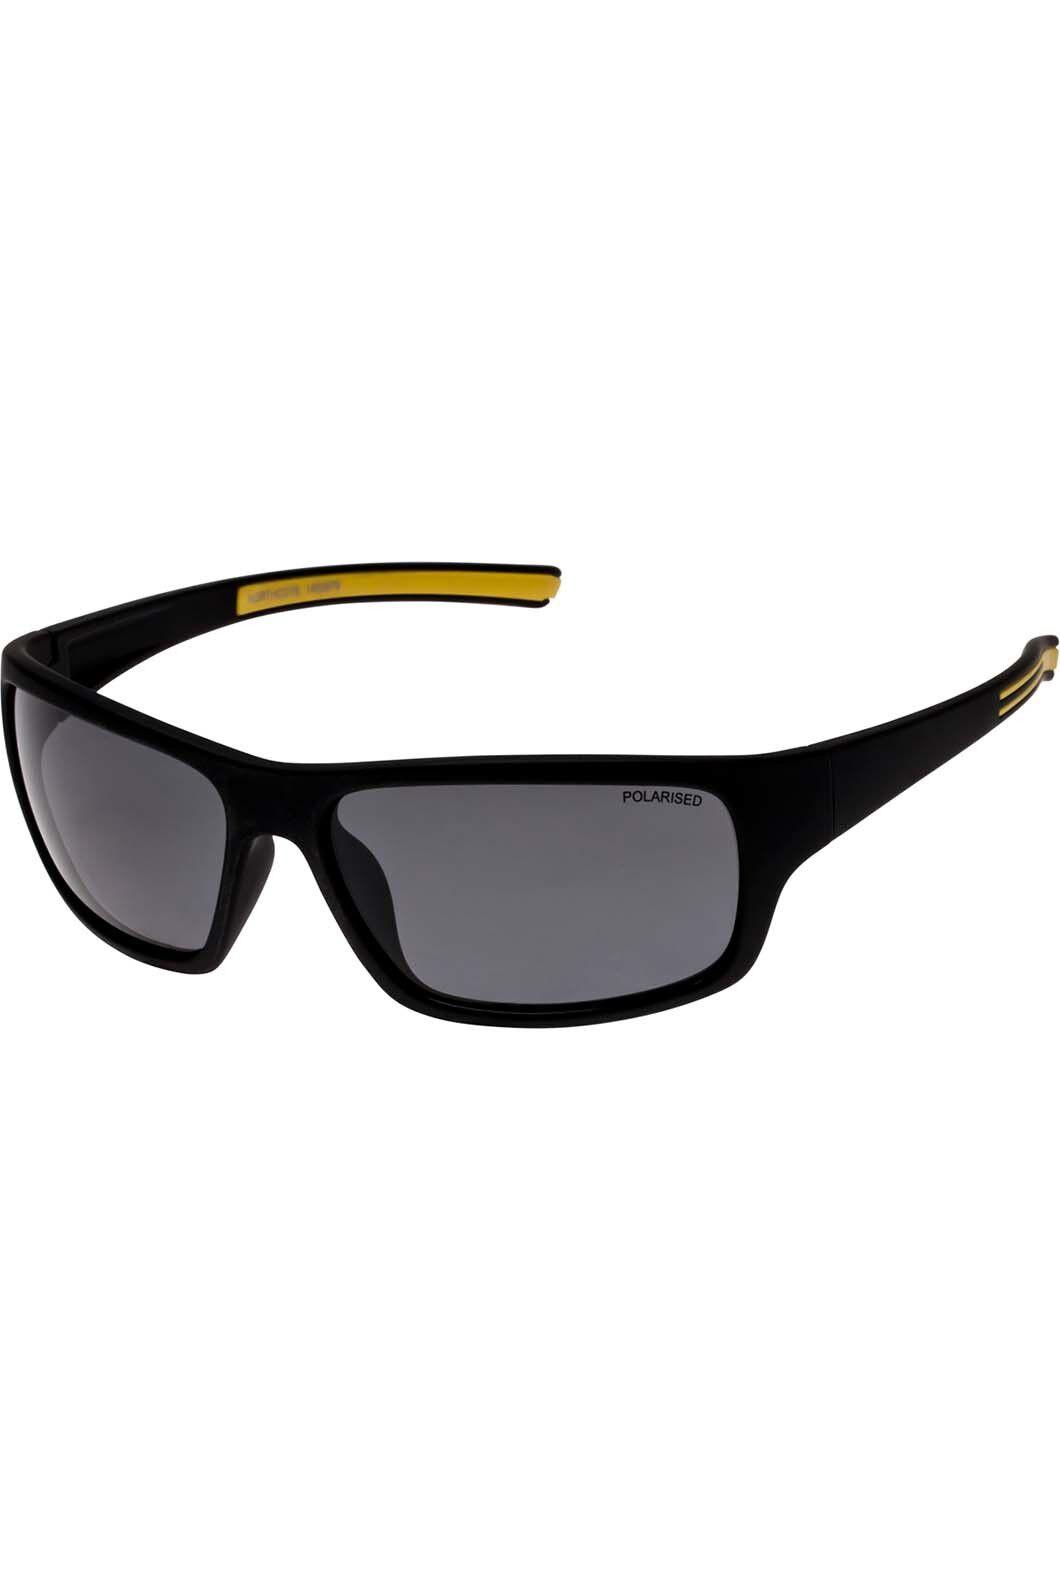 Cancer Council Men's Northcote Polarised Sunglasses, Black, hi-res